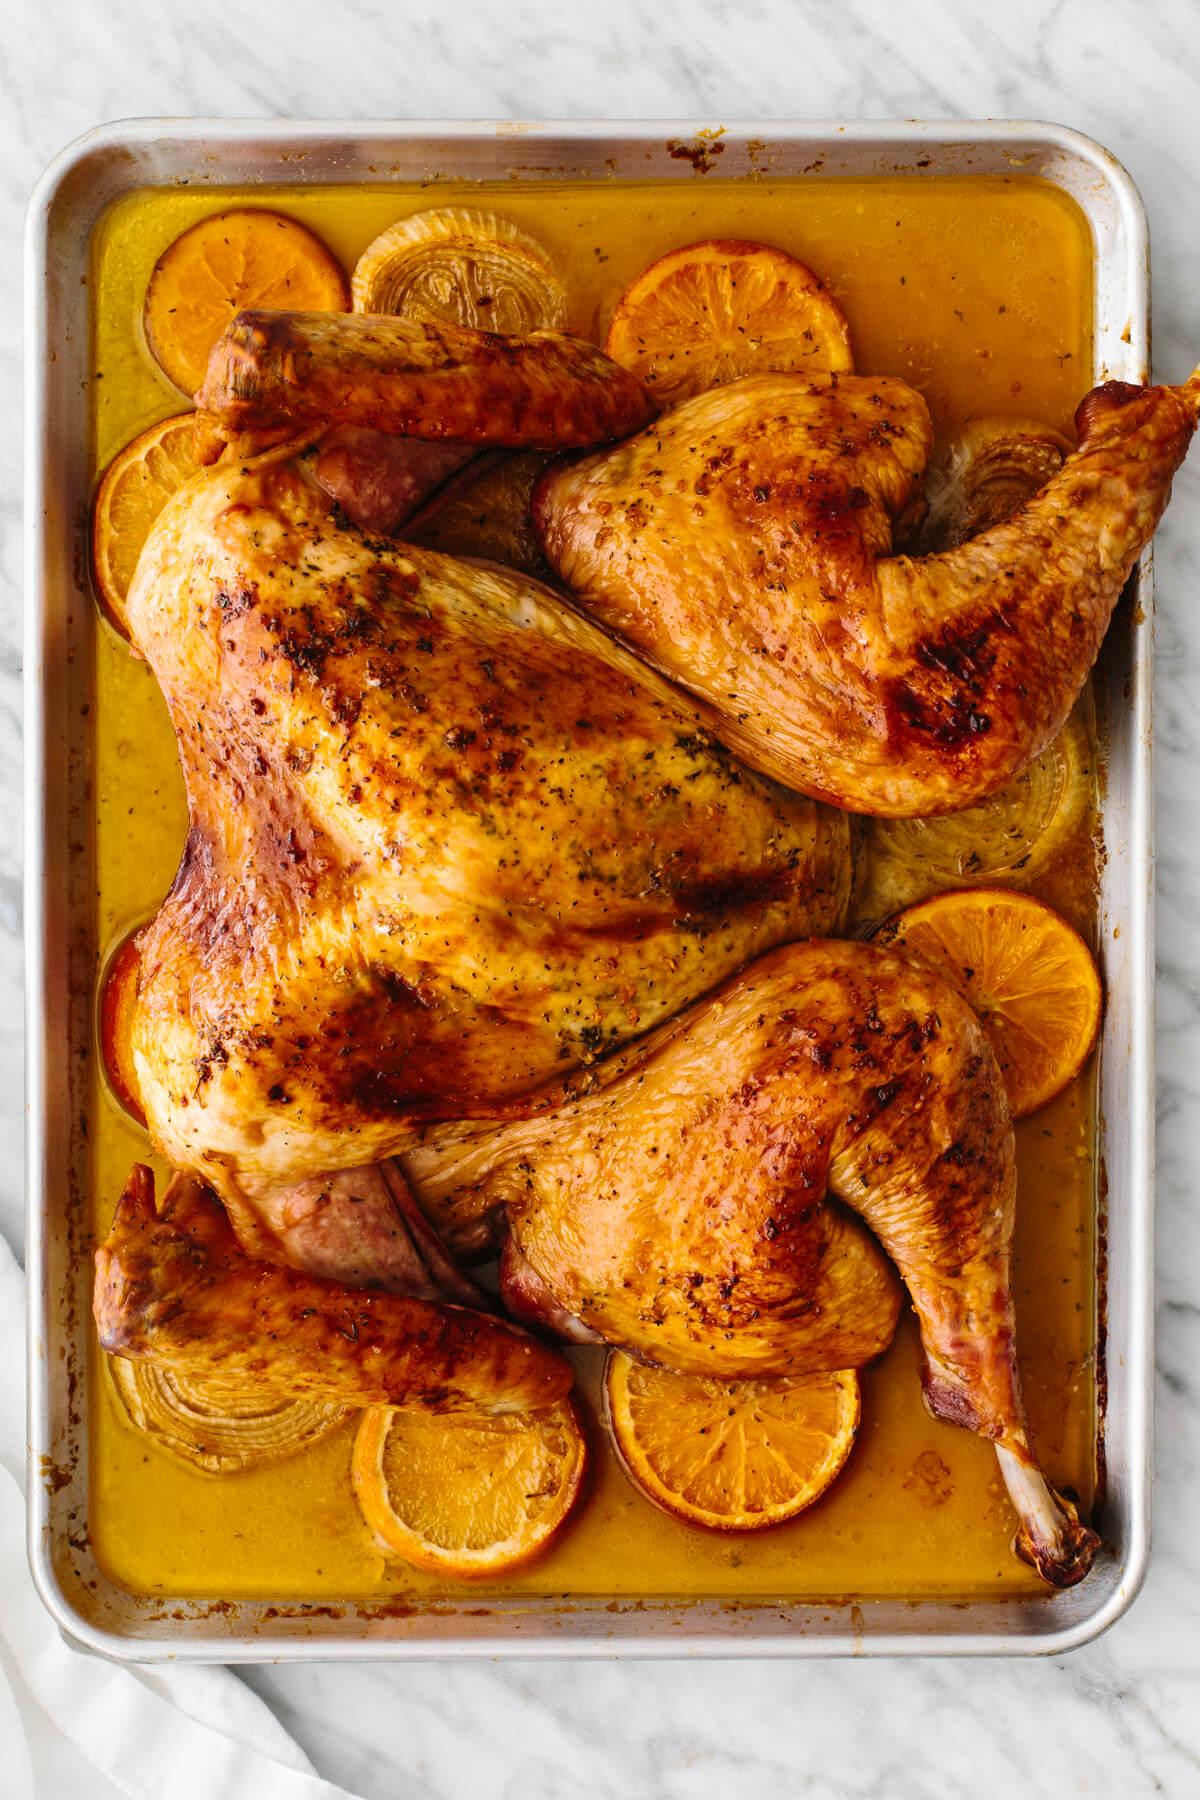 A baking sheet with an orange glazed spatchcock turkey